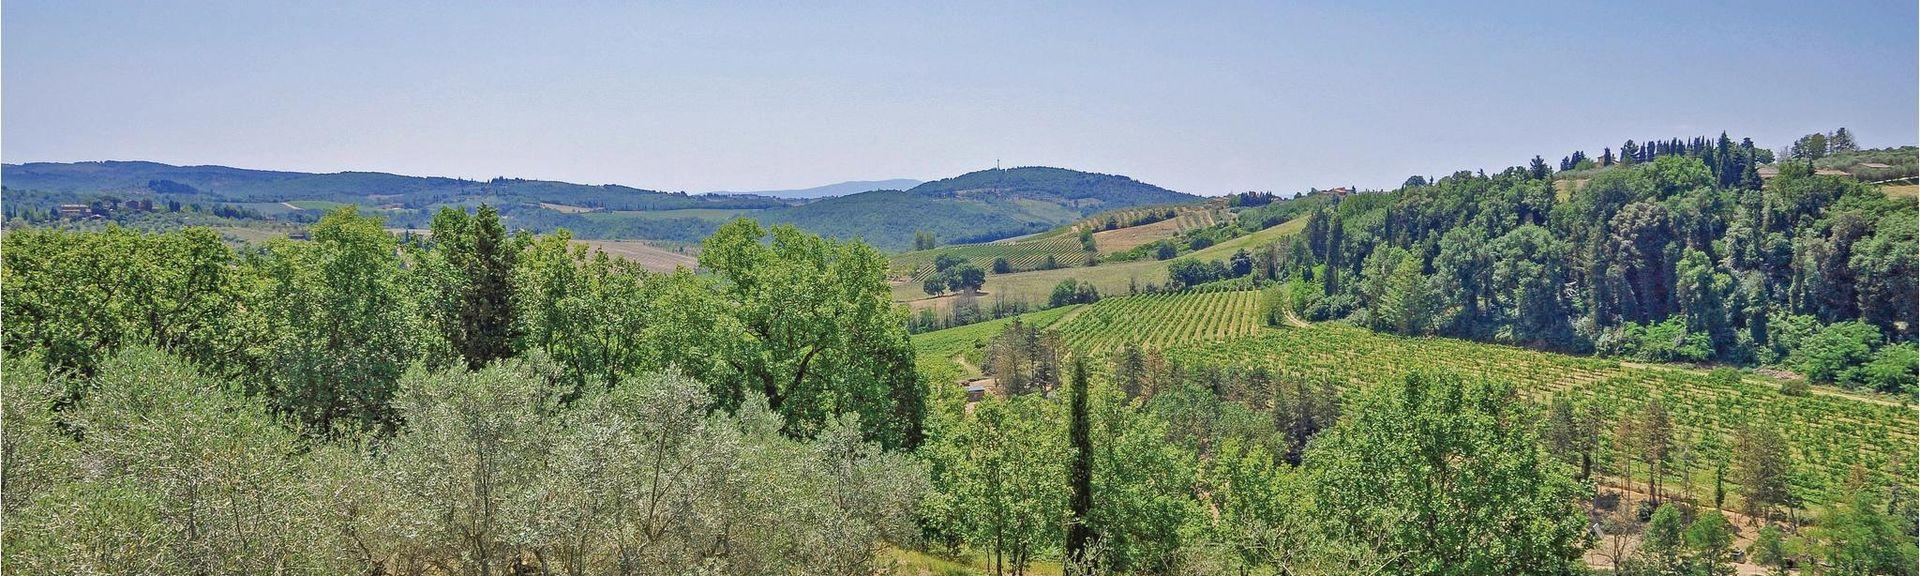 Serravalle Pistoiese, Τοσκάνη, Ιταλία